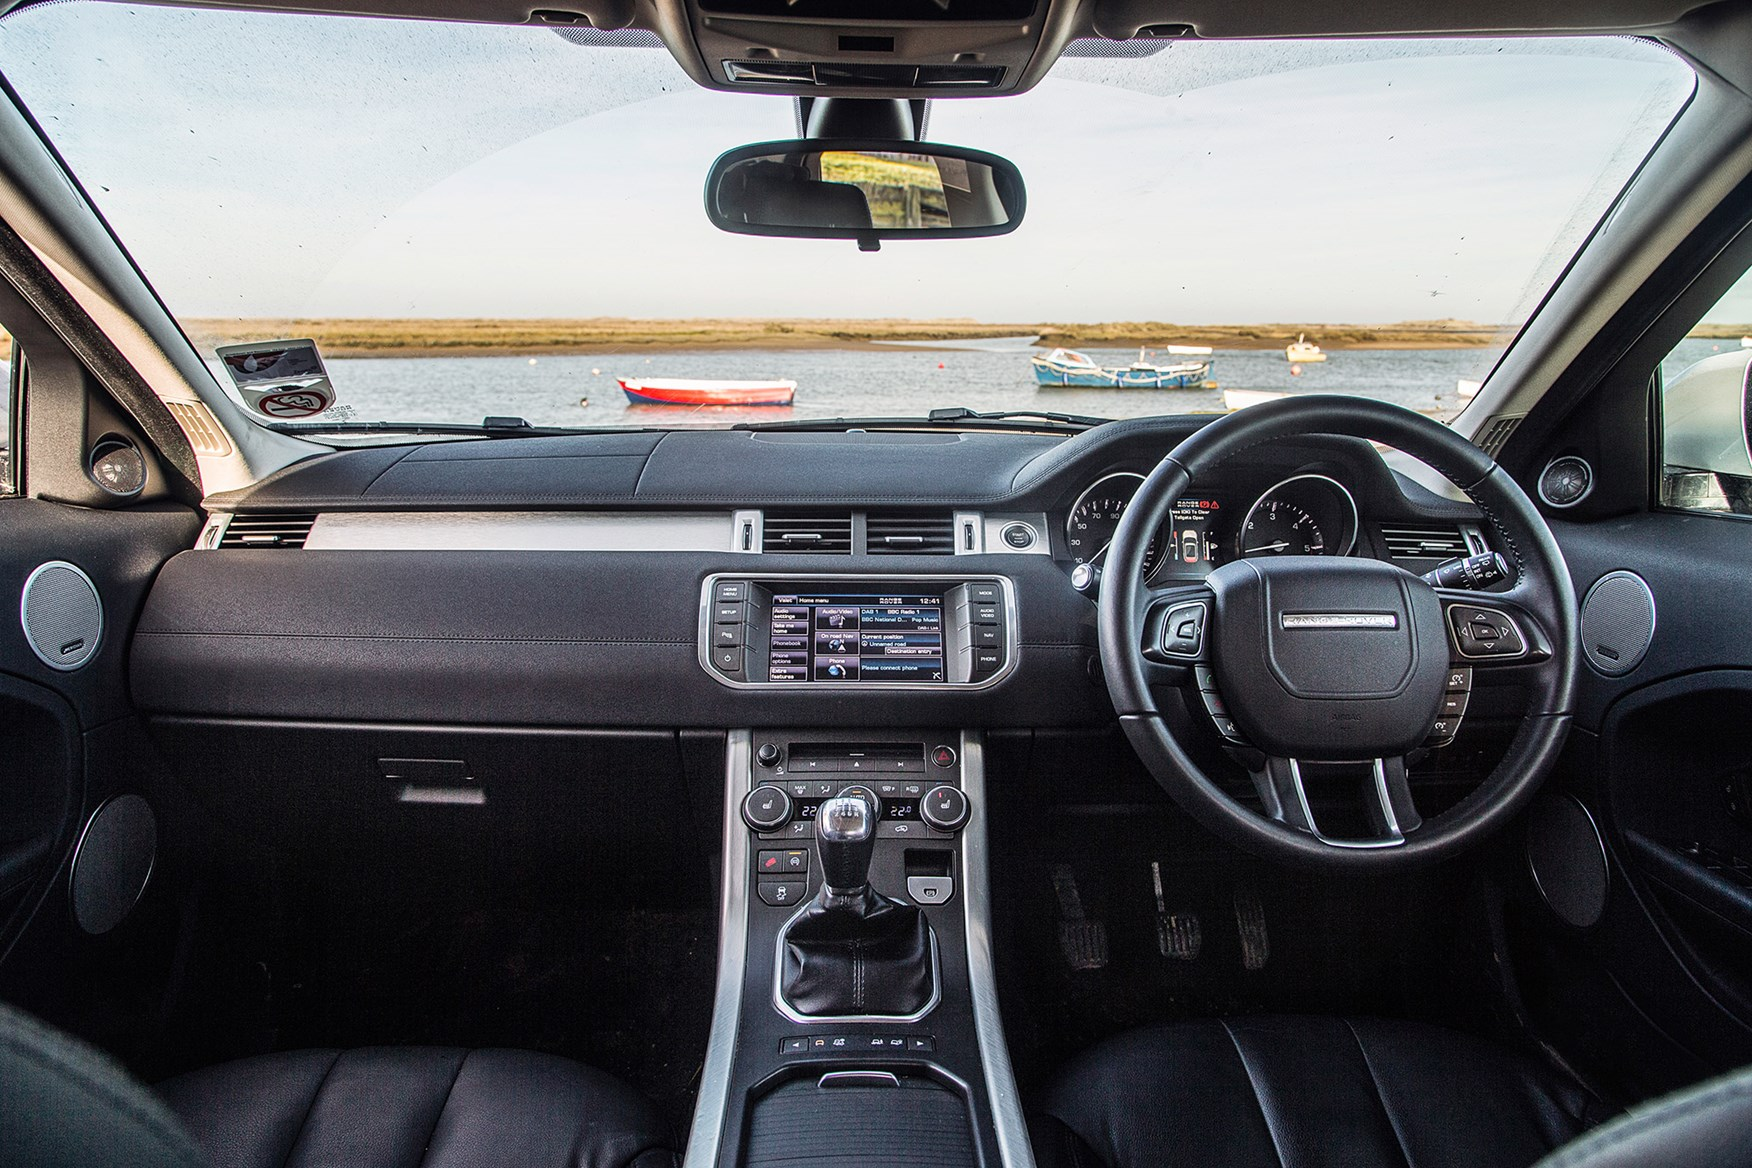 Land Rover Discovery Sport vs Audi Q5 vs Jeep Cherokee vs ...